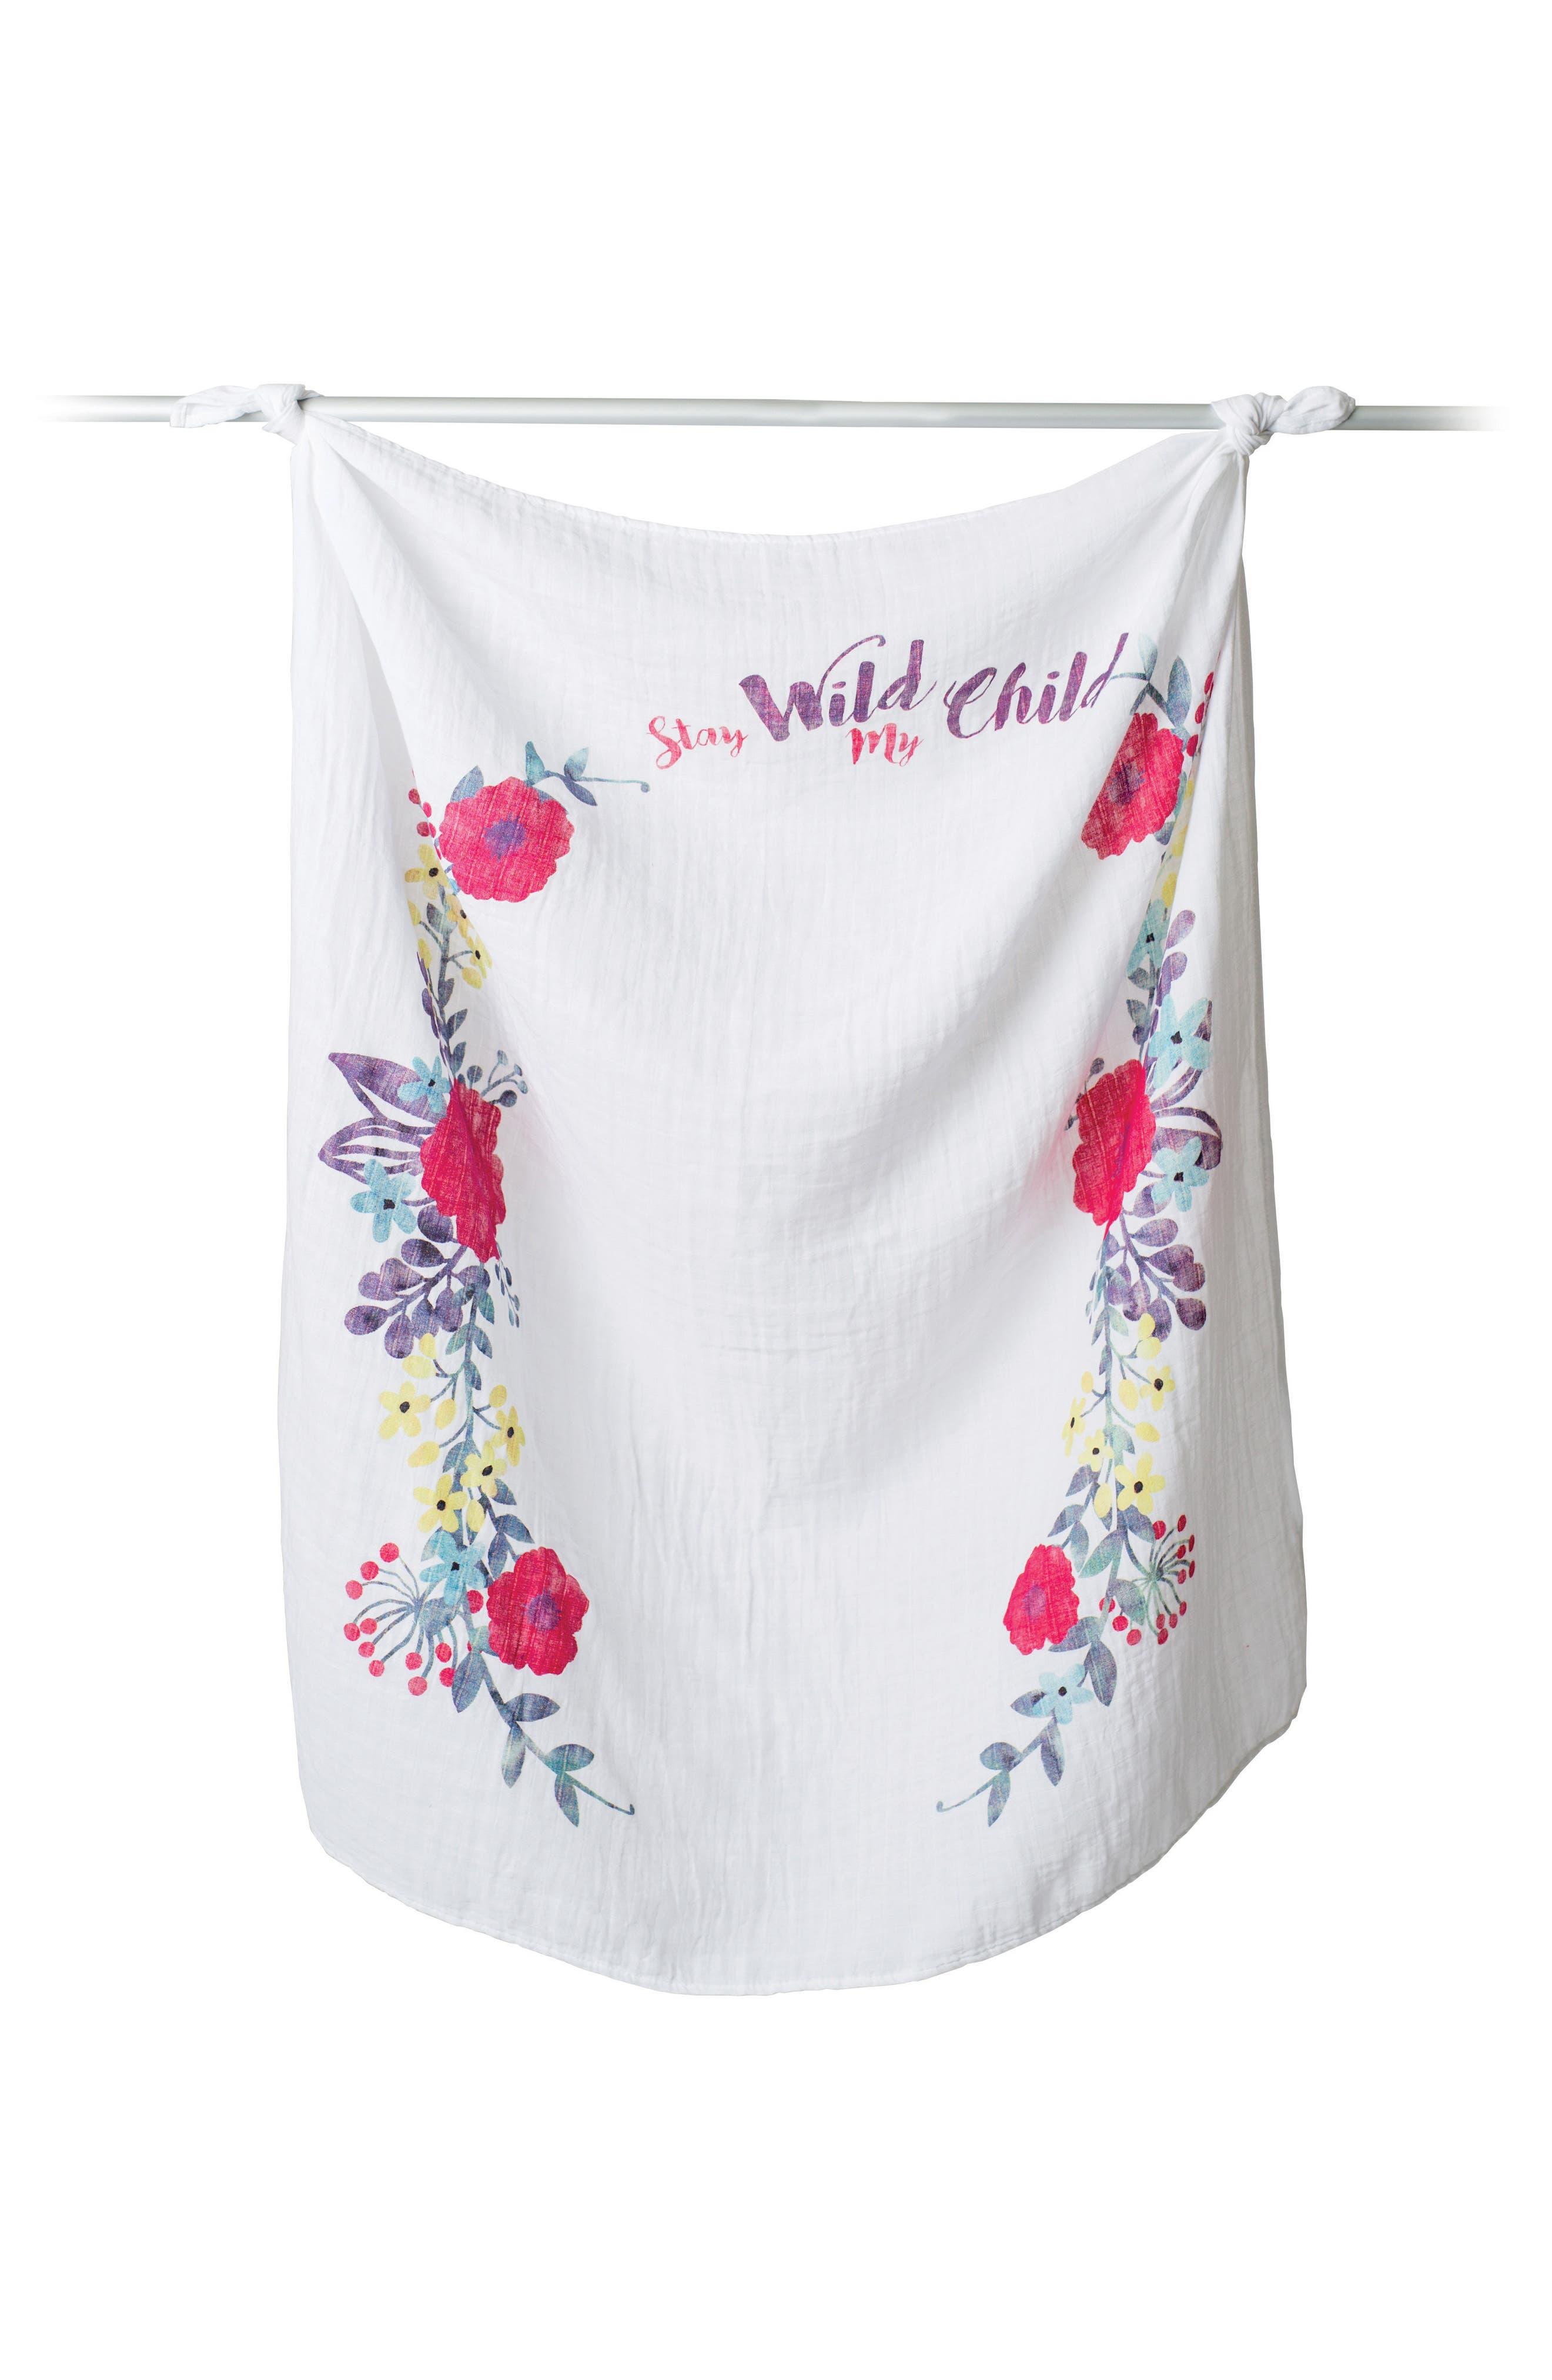 Lulujo Baby's First Year - Stay Wild My Child Muslin Blanket & Milestone Card Set (Baby Girls)